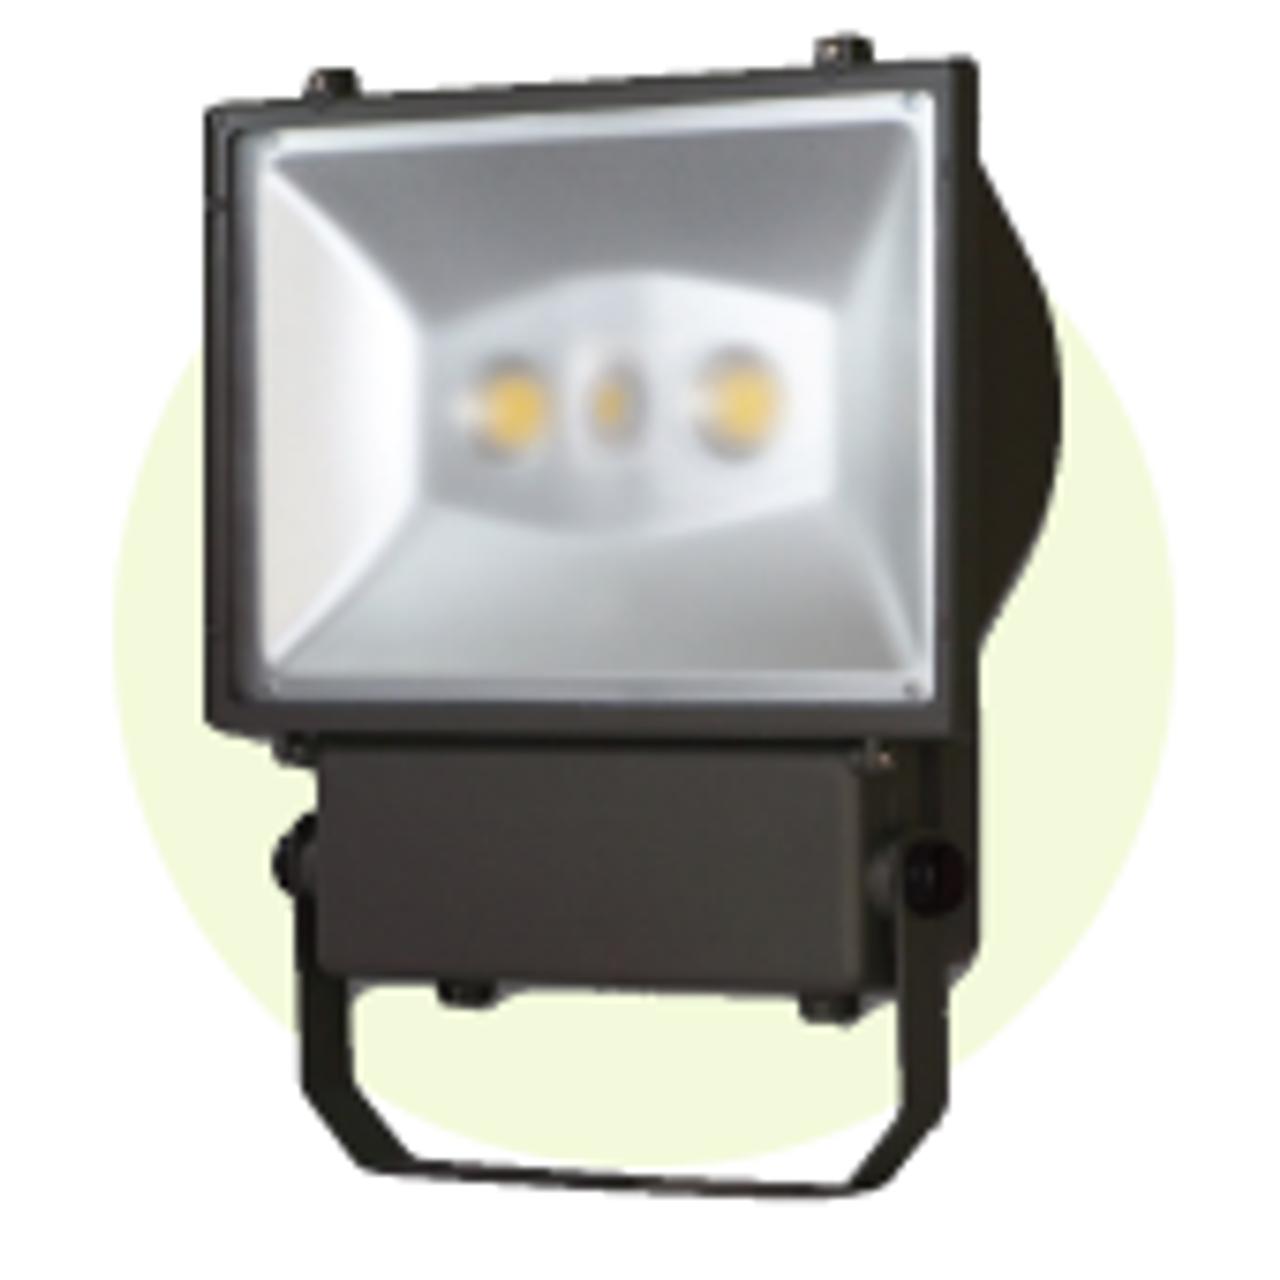 LED Flood Lights and LED Spotlights